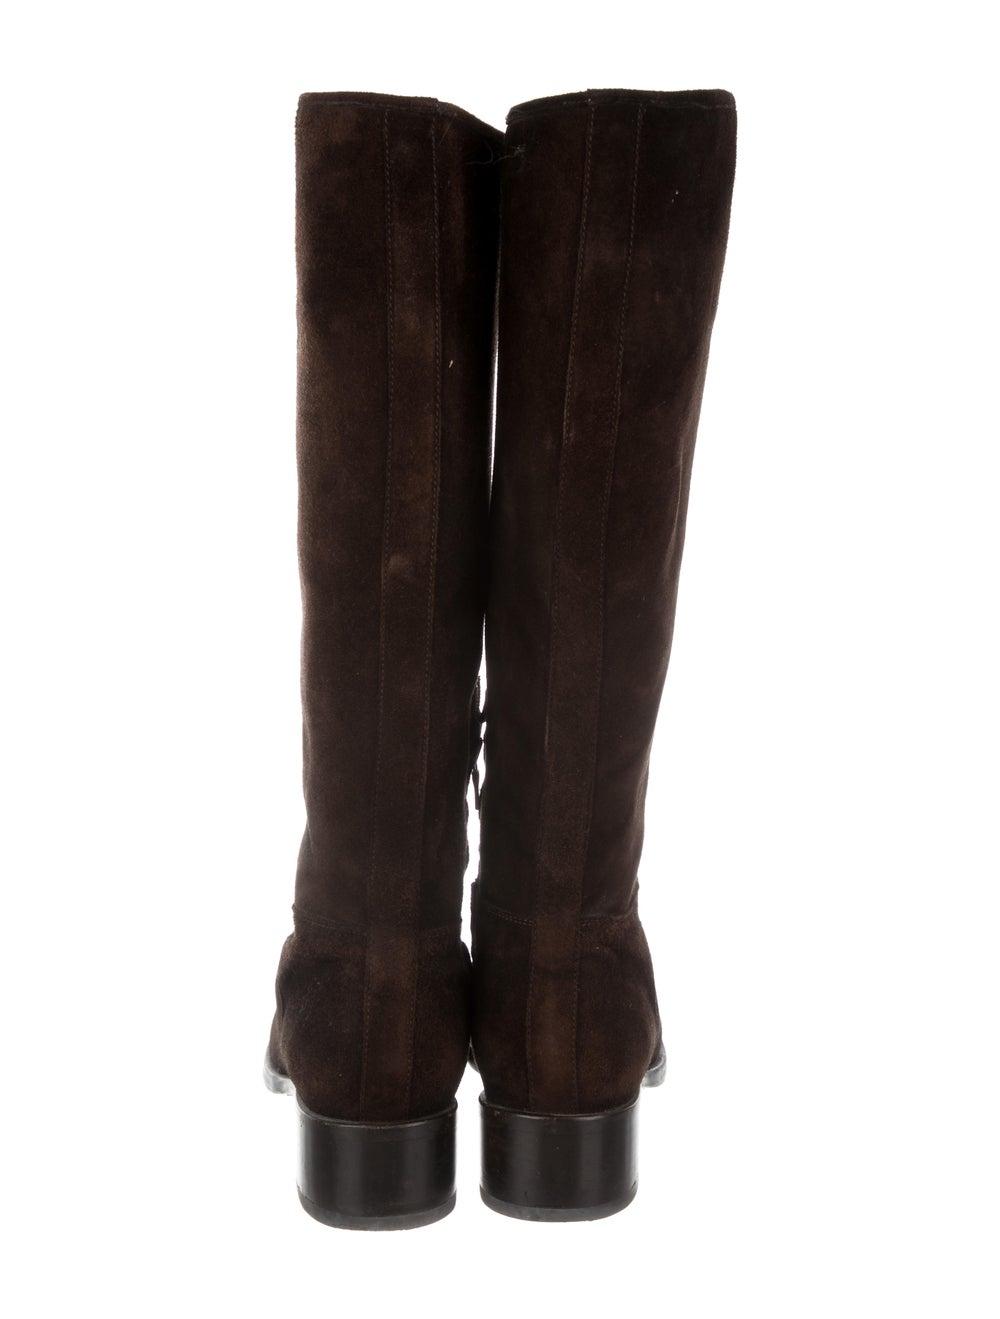 Prada Suede Knee-High Boots Brown - image 4